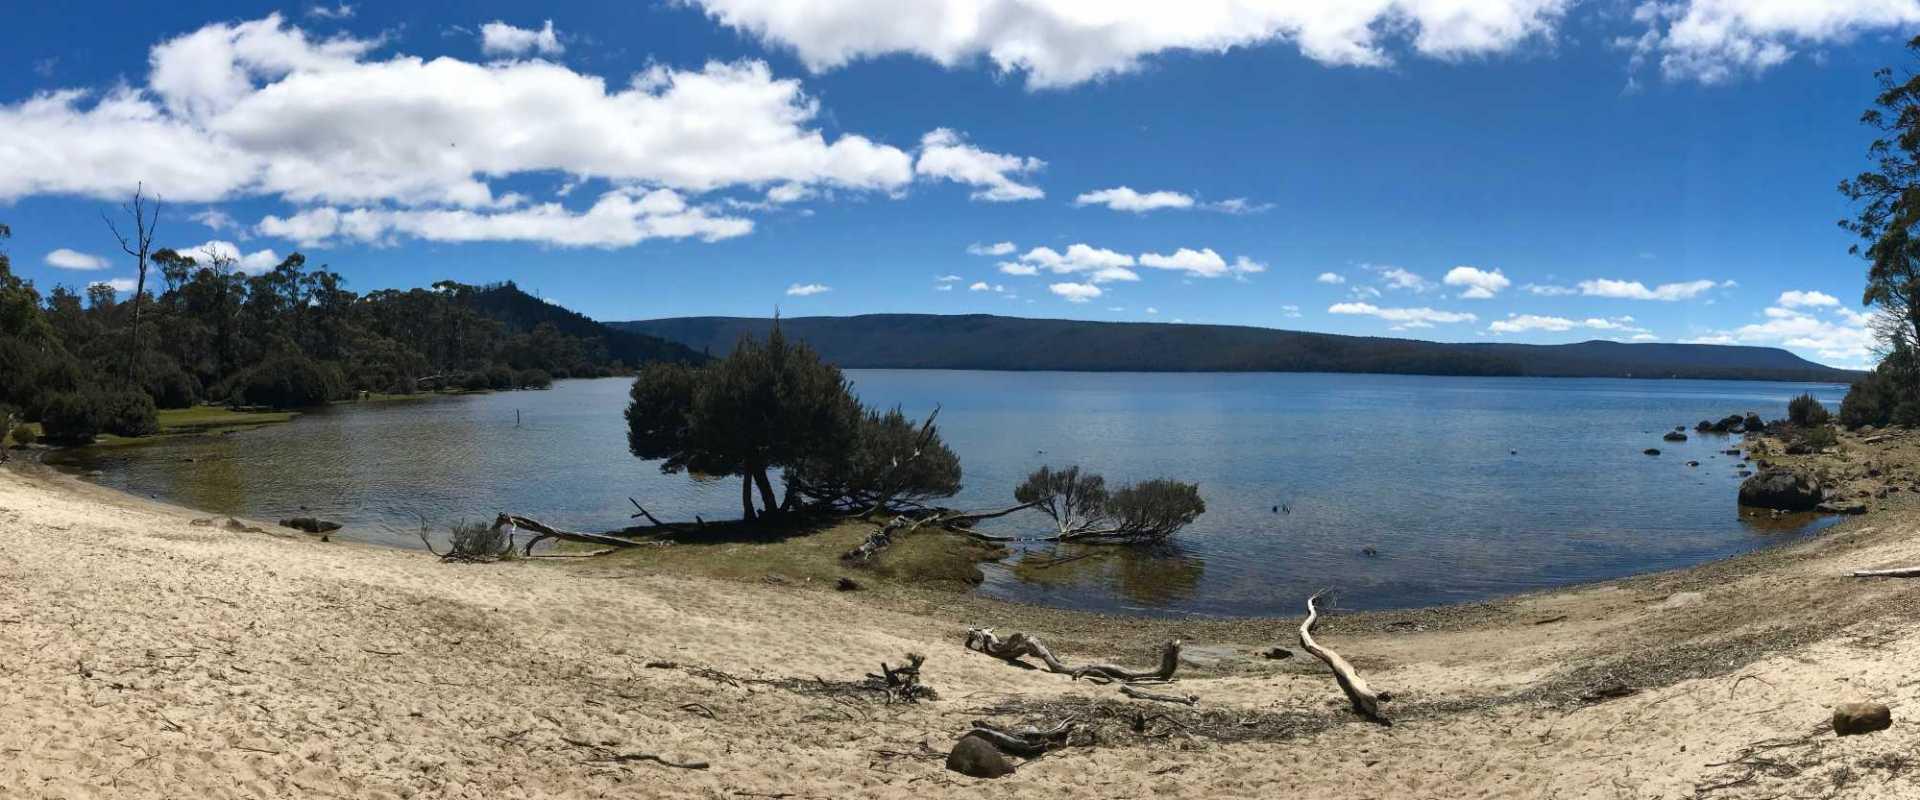 Lake St Claire Tasmania